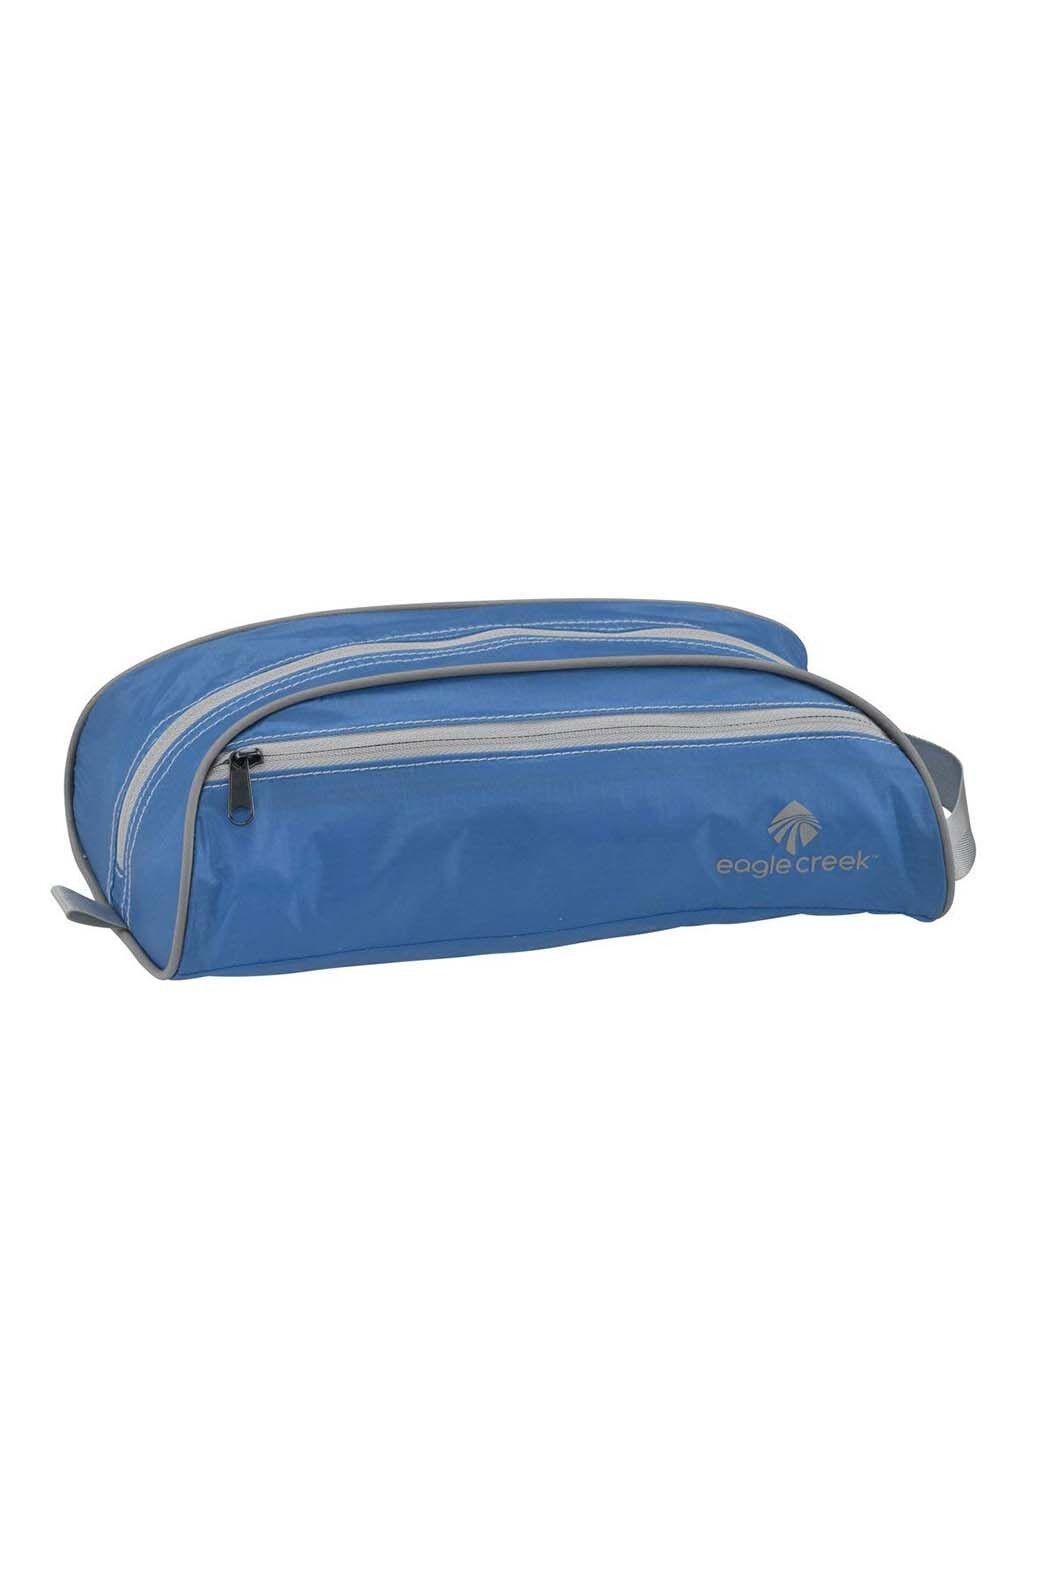 Eagle Creek Pack-It Specter Quick Trip Strobe, Brilliant Blue, hi-res